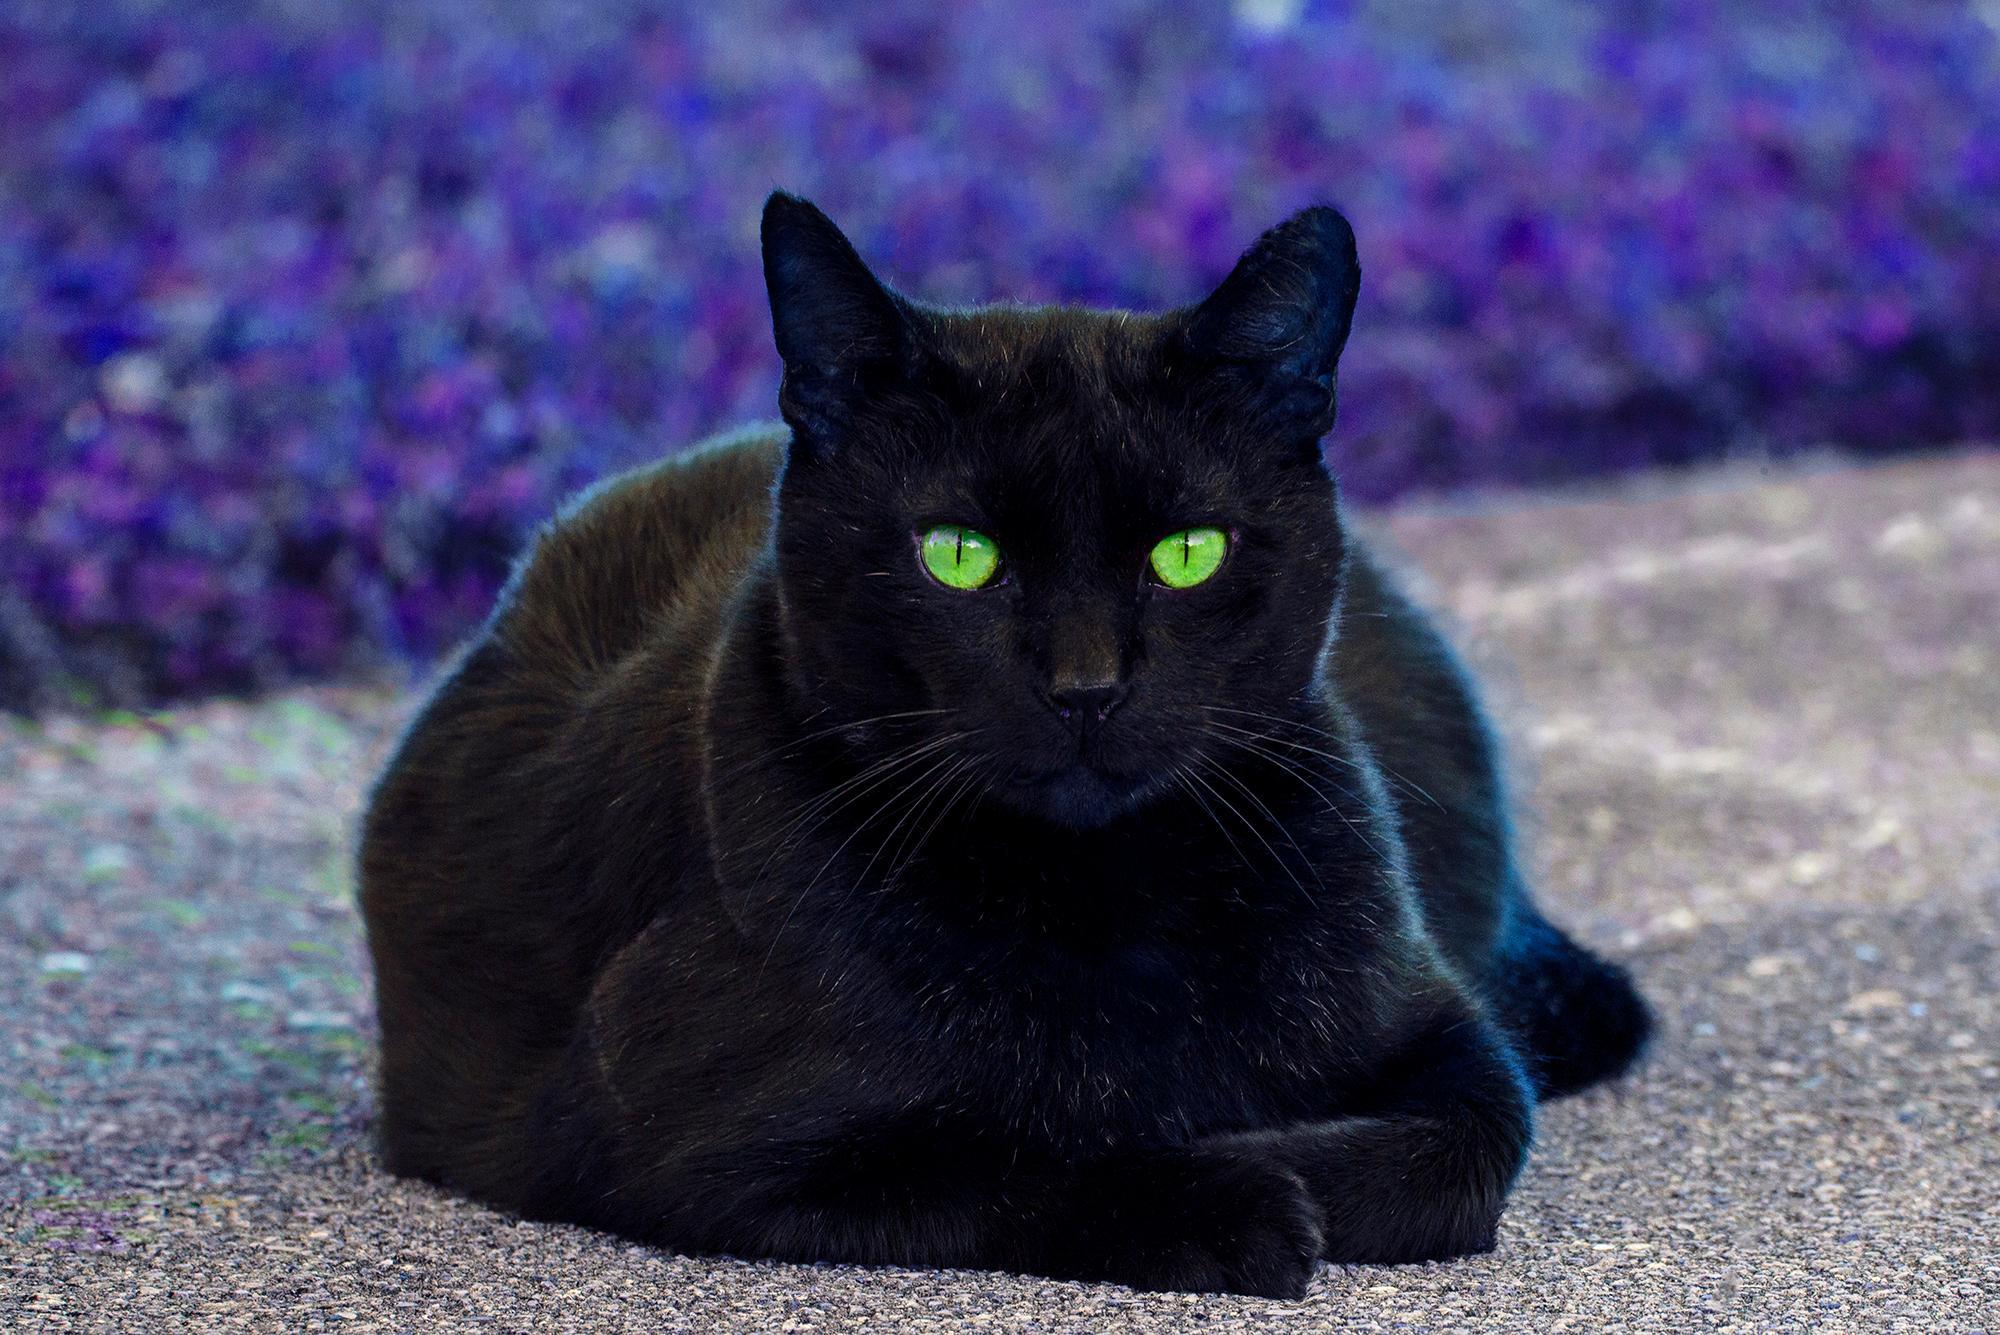 Black Cat. Green Eyes